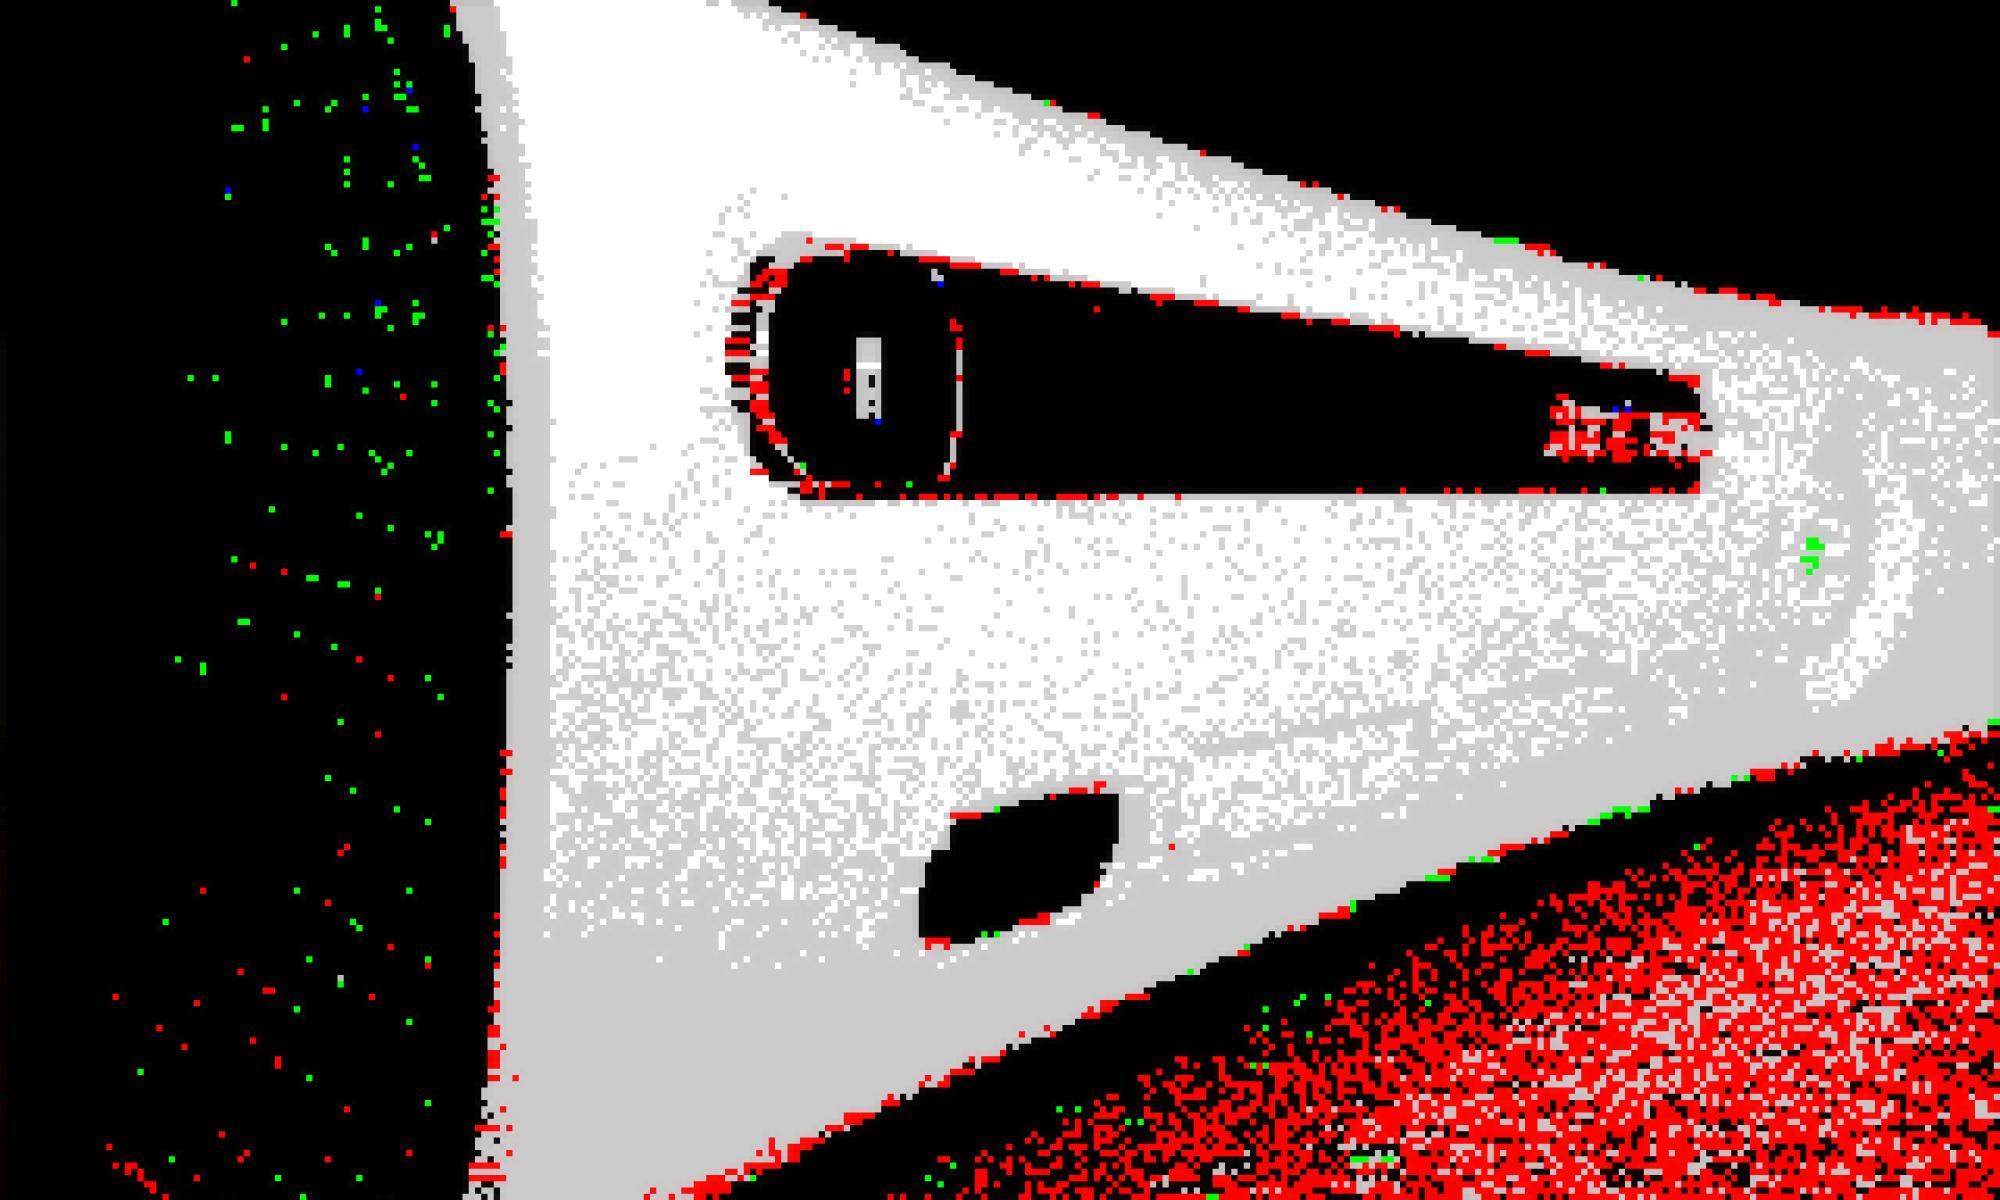 Spypixel